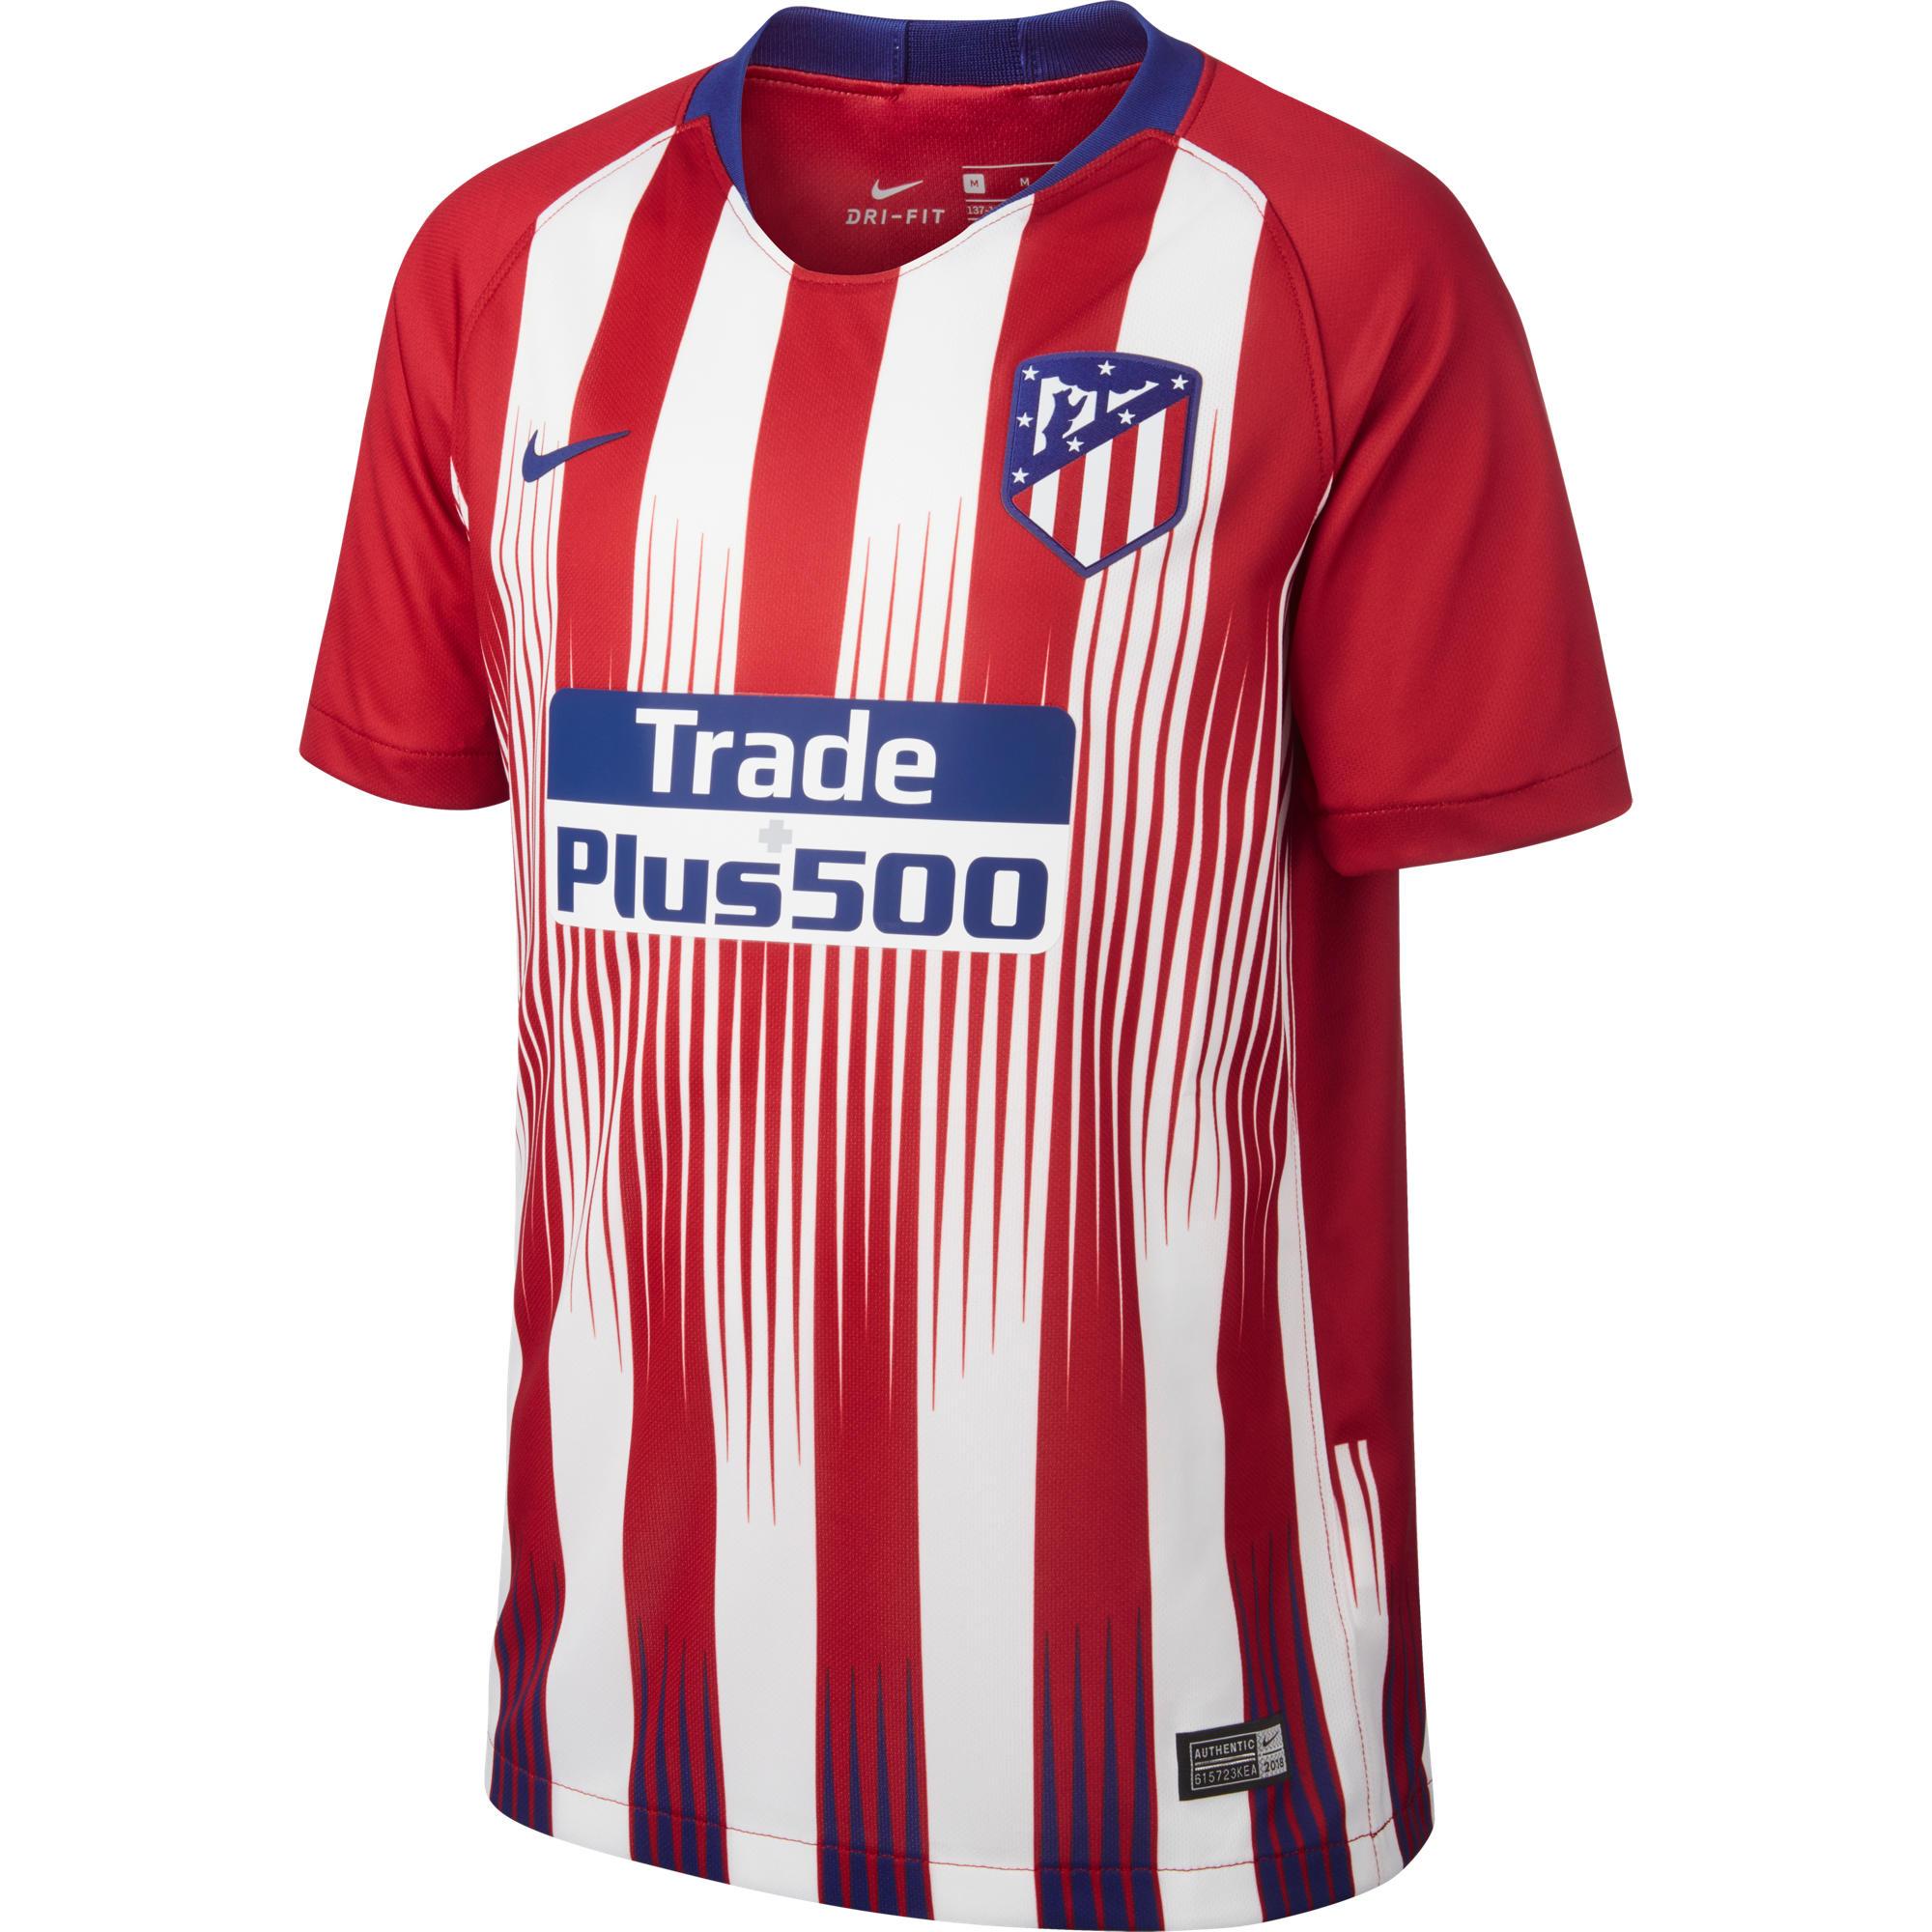 Fußballtrikot Atletico Madrid Replica Erwachsene rot/weiß | Sportbekleidung > Trikots > Fußballtrikots | Nike